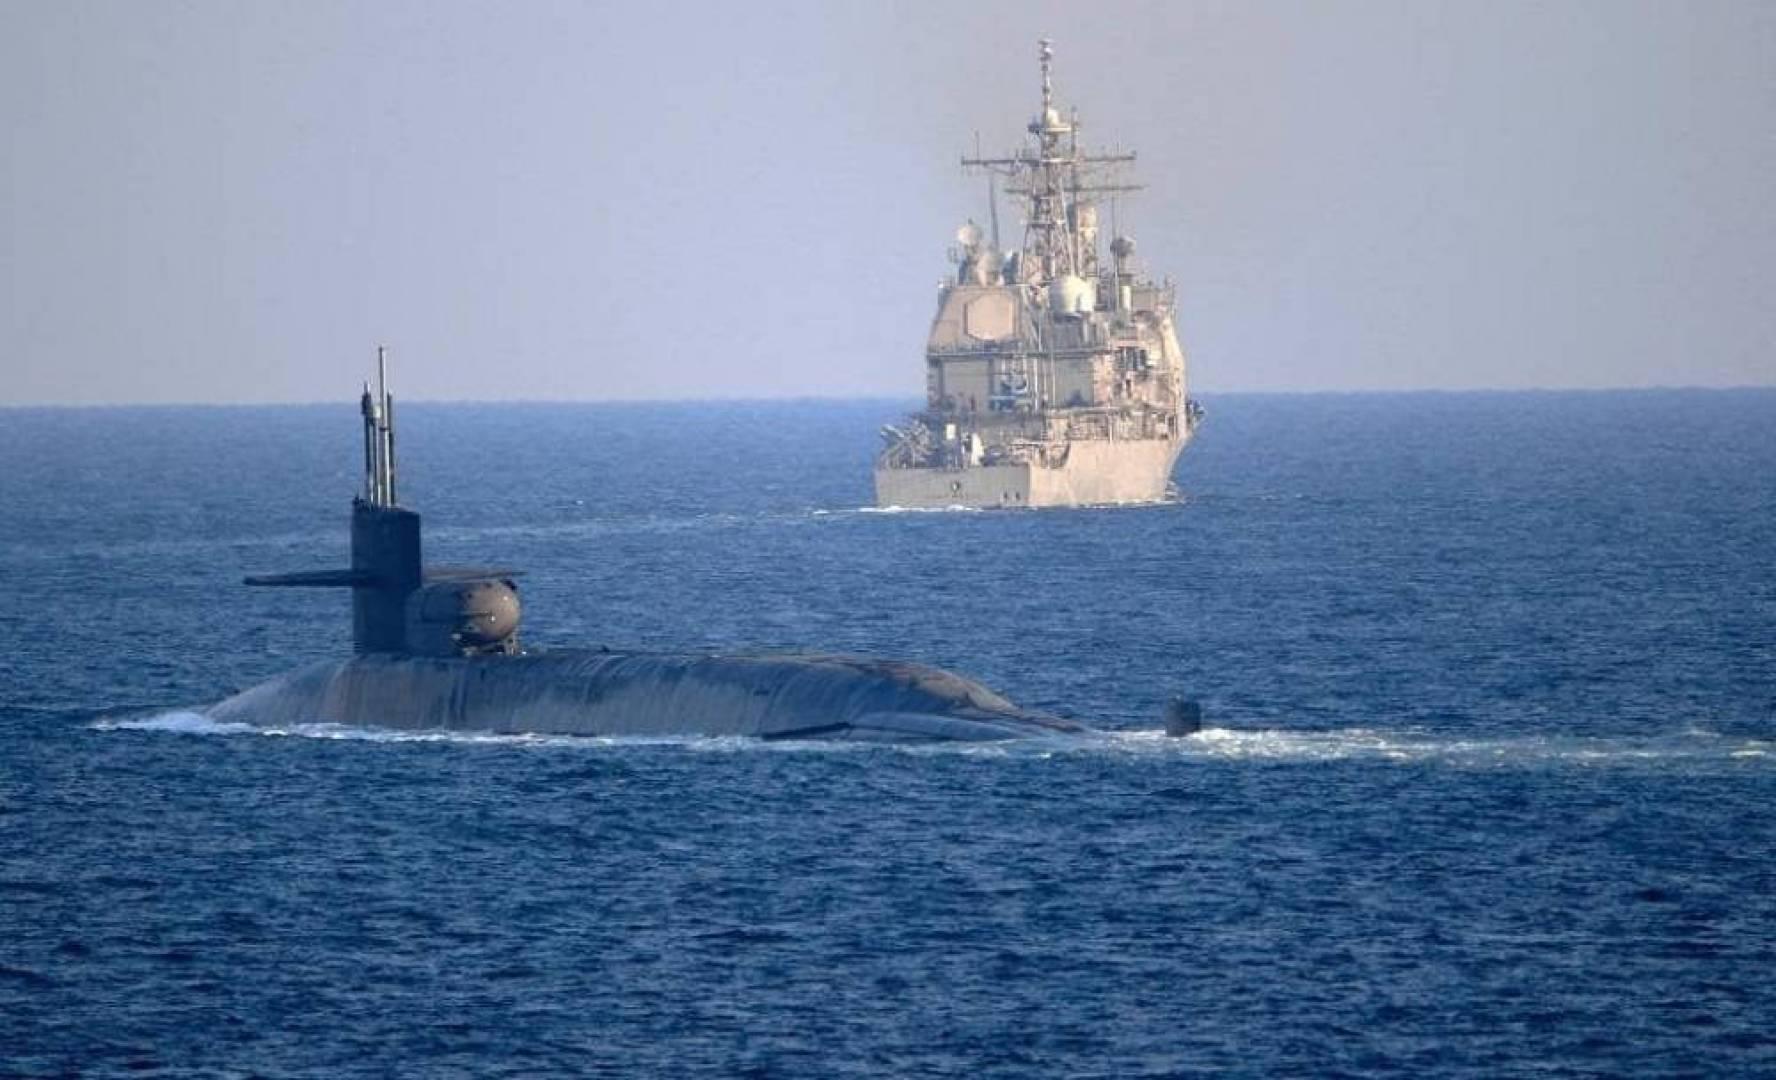 الغواصات ردع إستراتيجي جديد ضد إيران